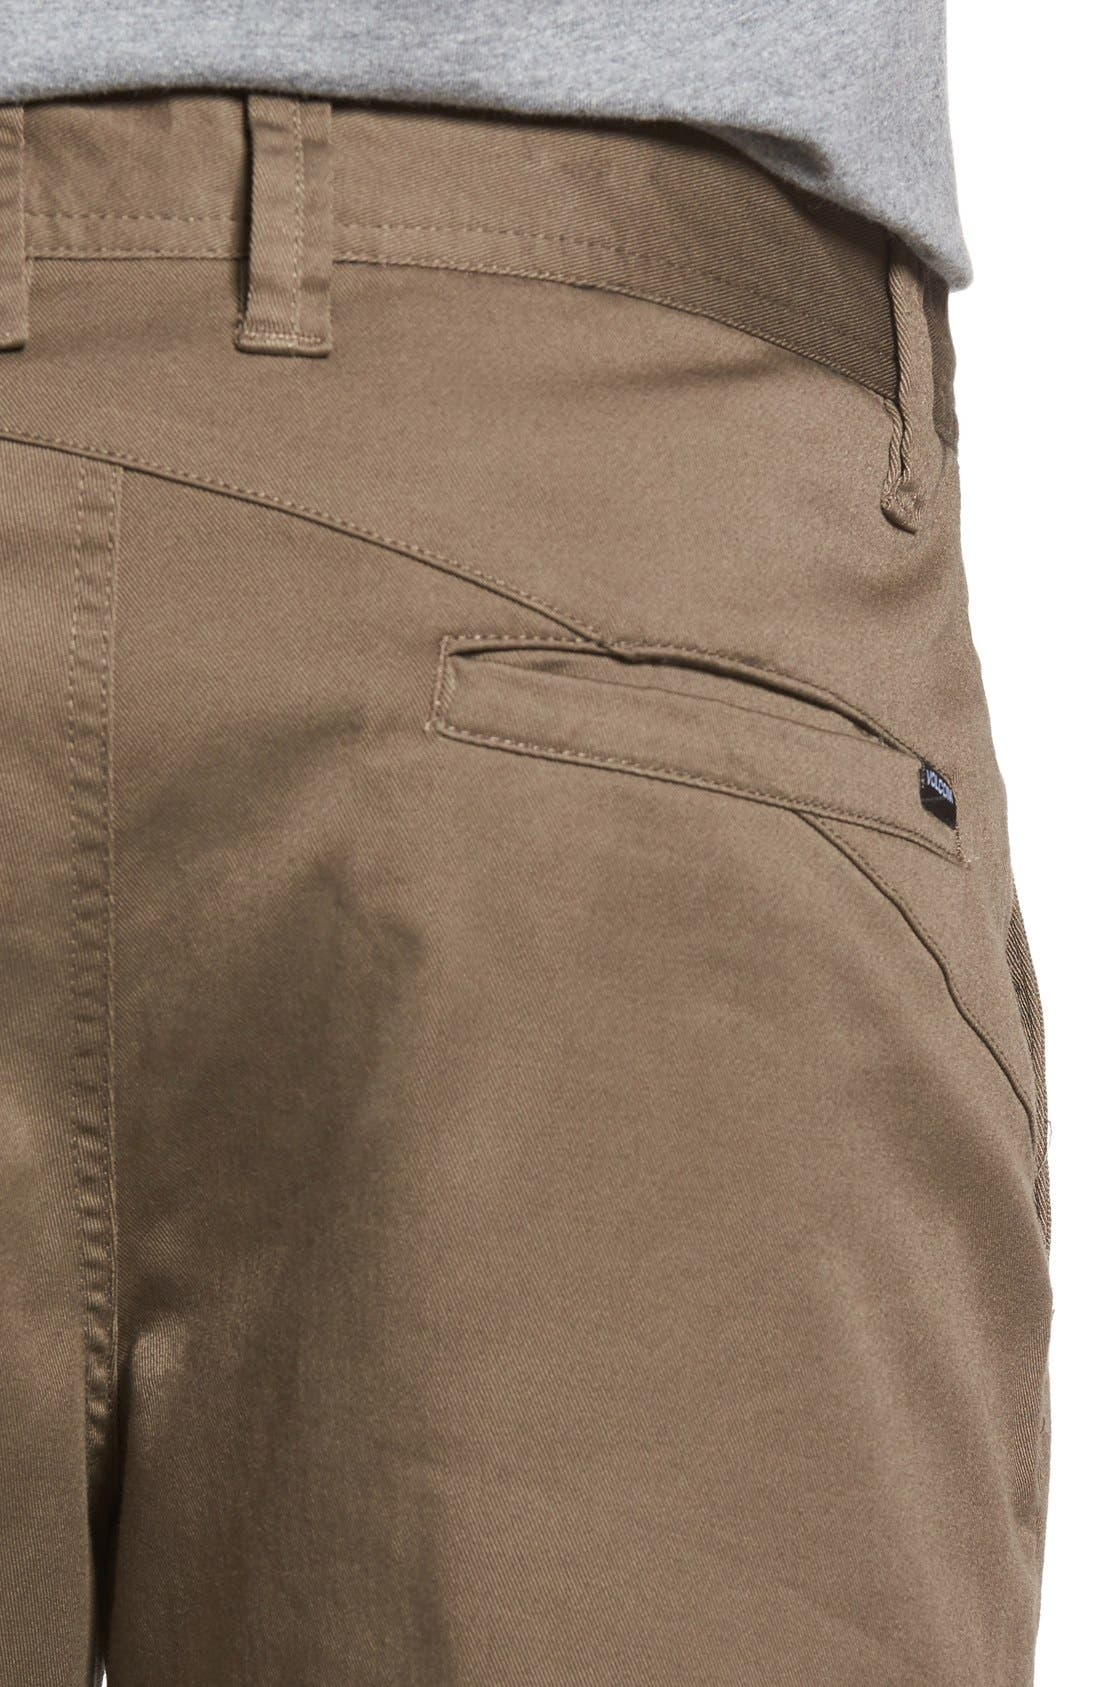 'Modern' Stretch Chino Shorts,                             Alternate thumbnail 4, color,                             Mushroom